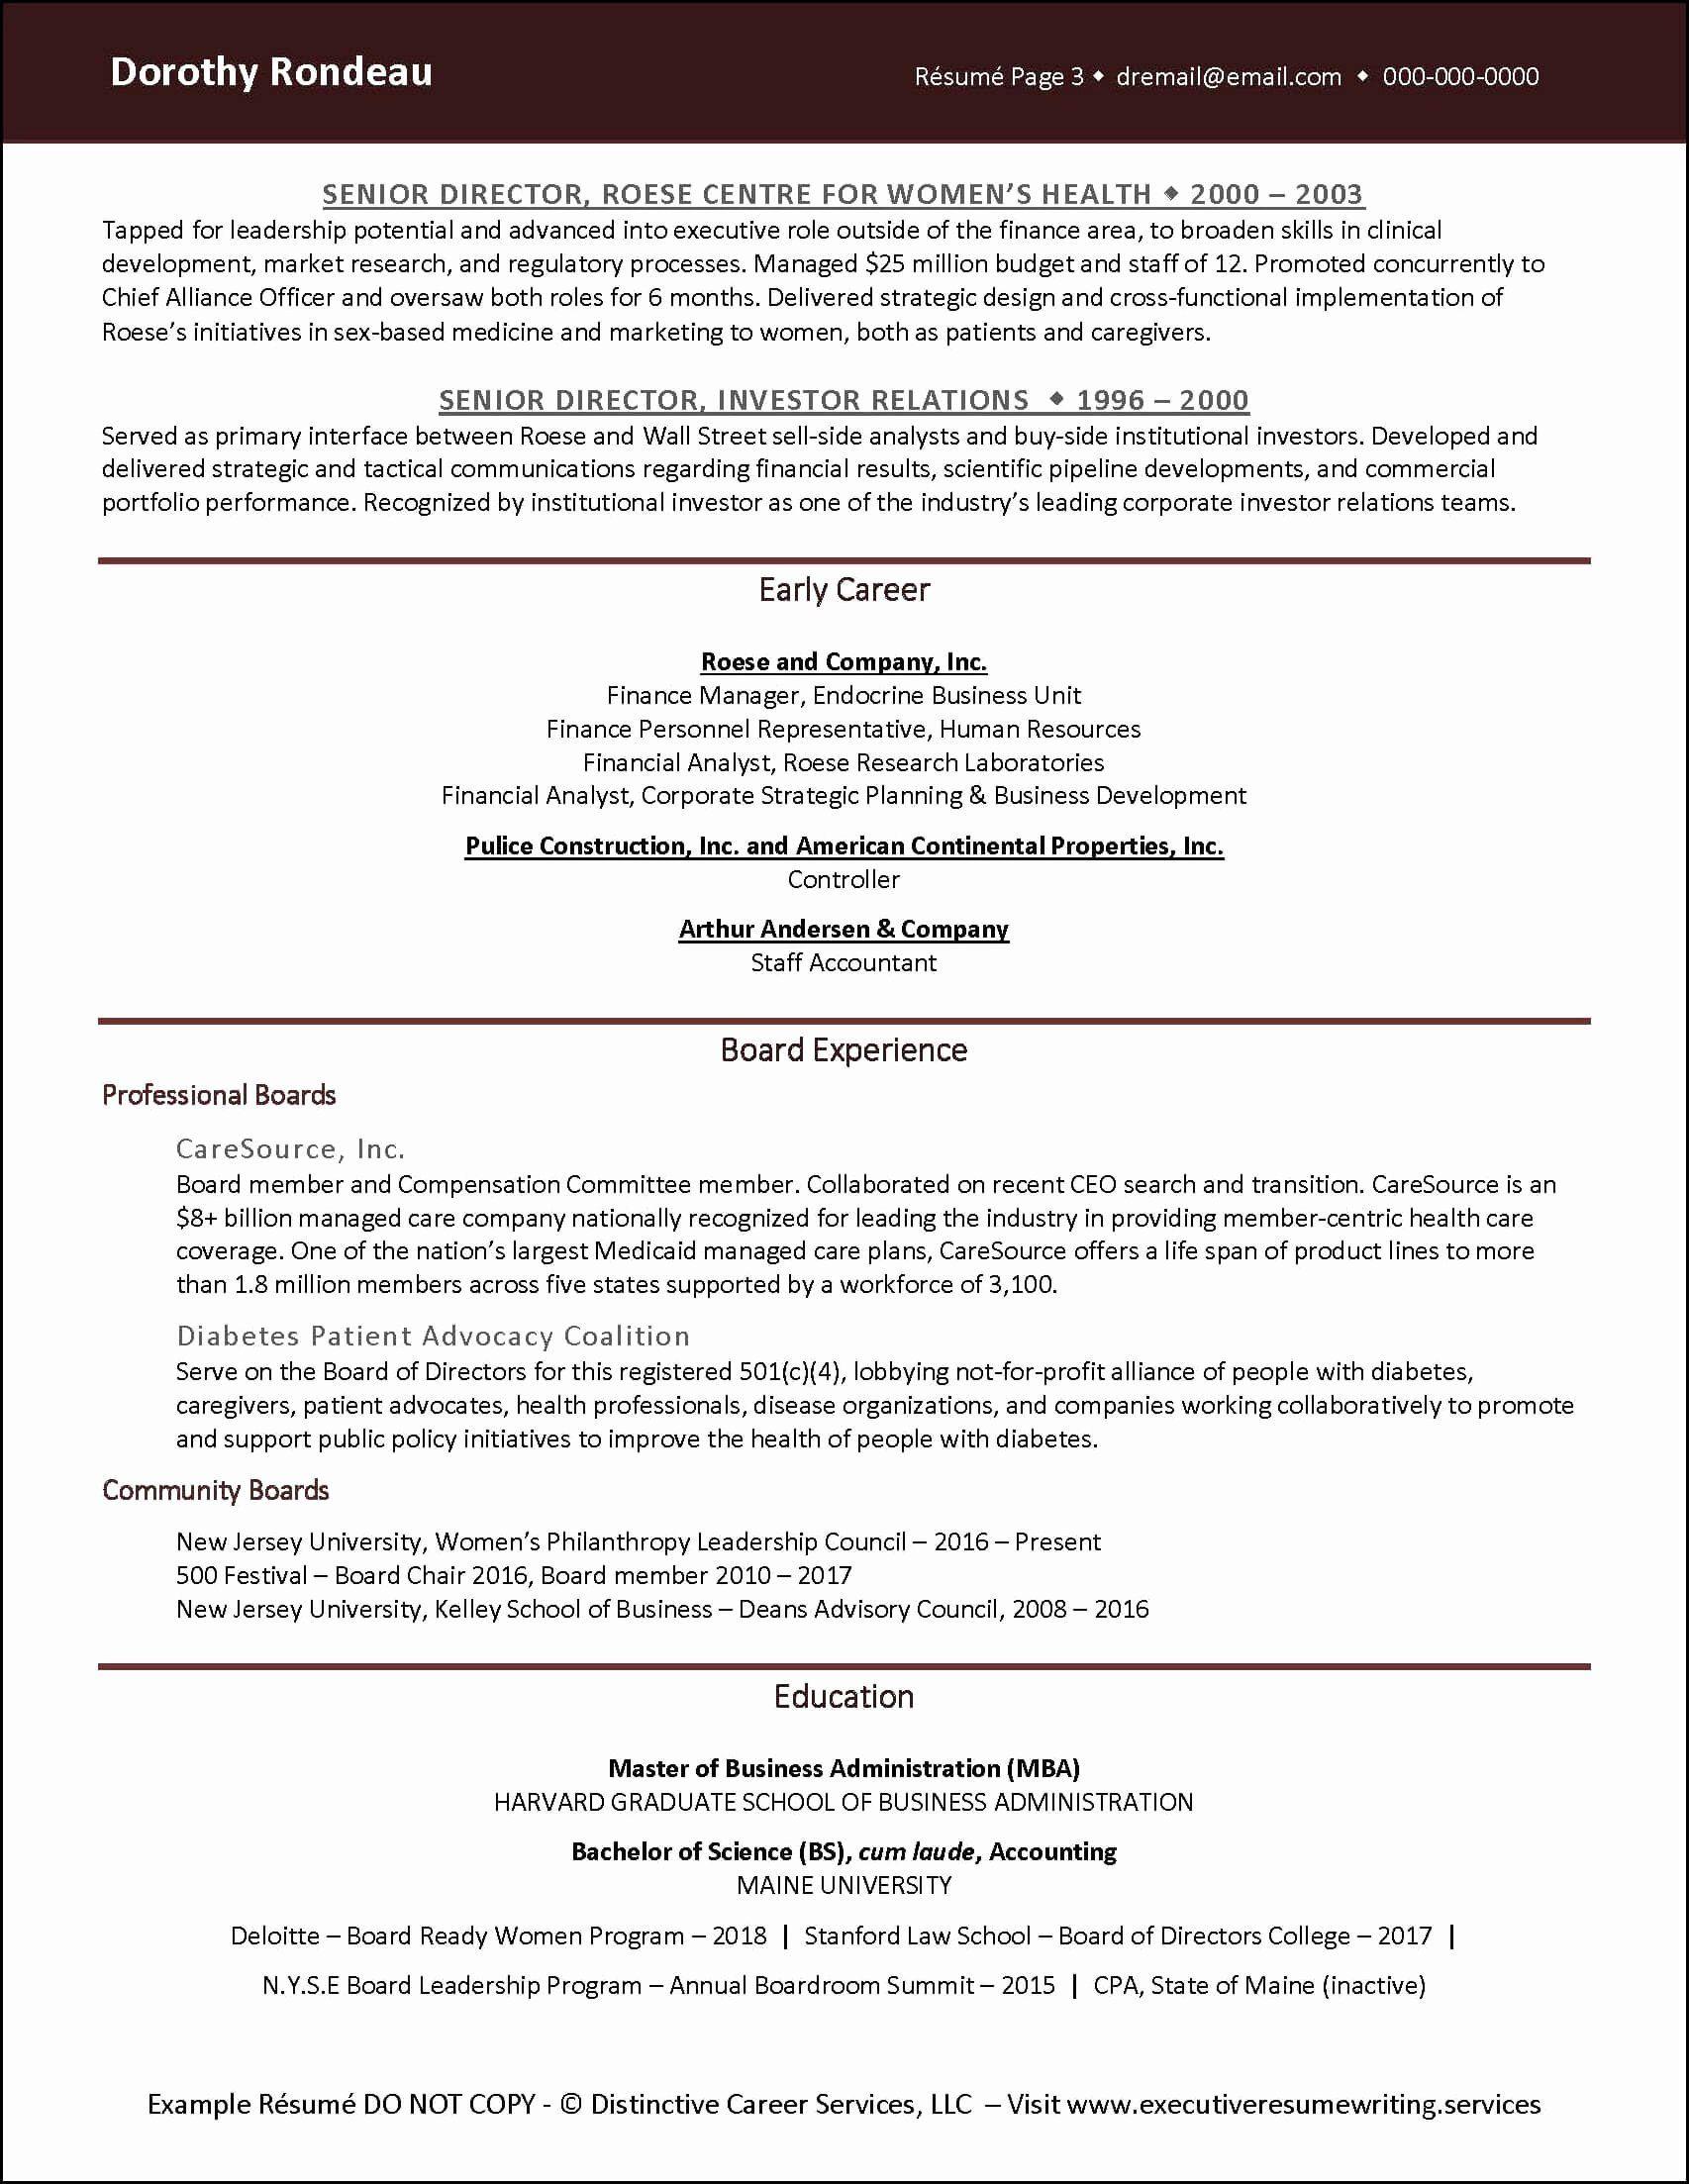 Board Of Directors Resume Unique Example Corporate Finance Executive Resume Pg 2 Board Of Directors Job Resume Samples Resume